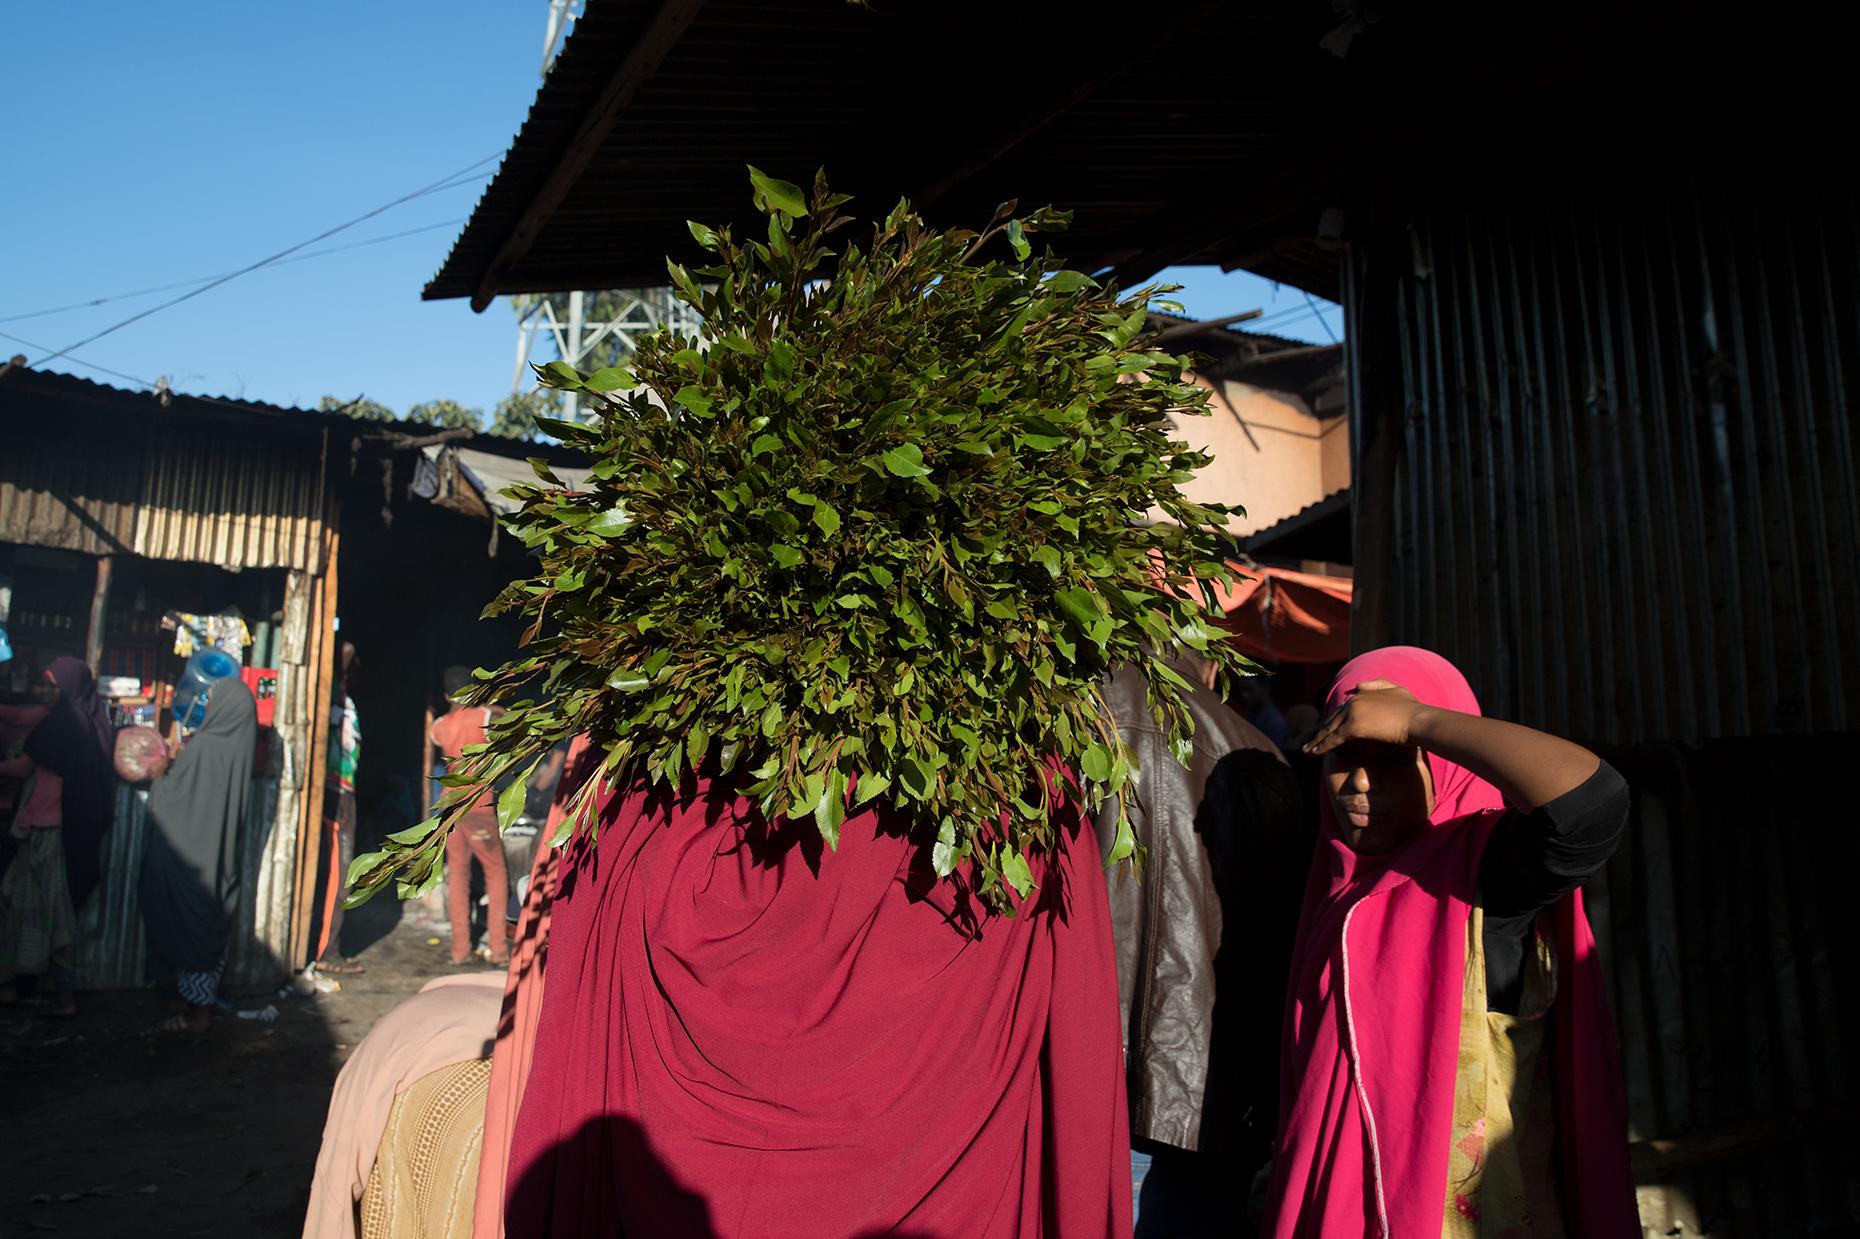 khat ethiopia harar market bunch Awaday